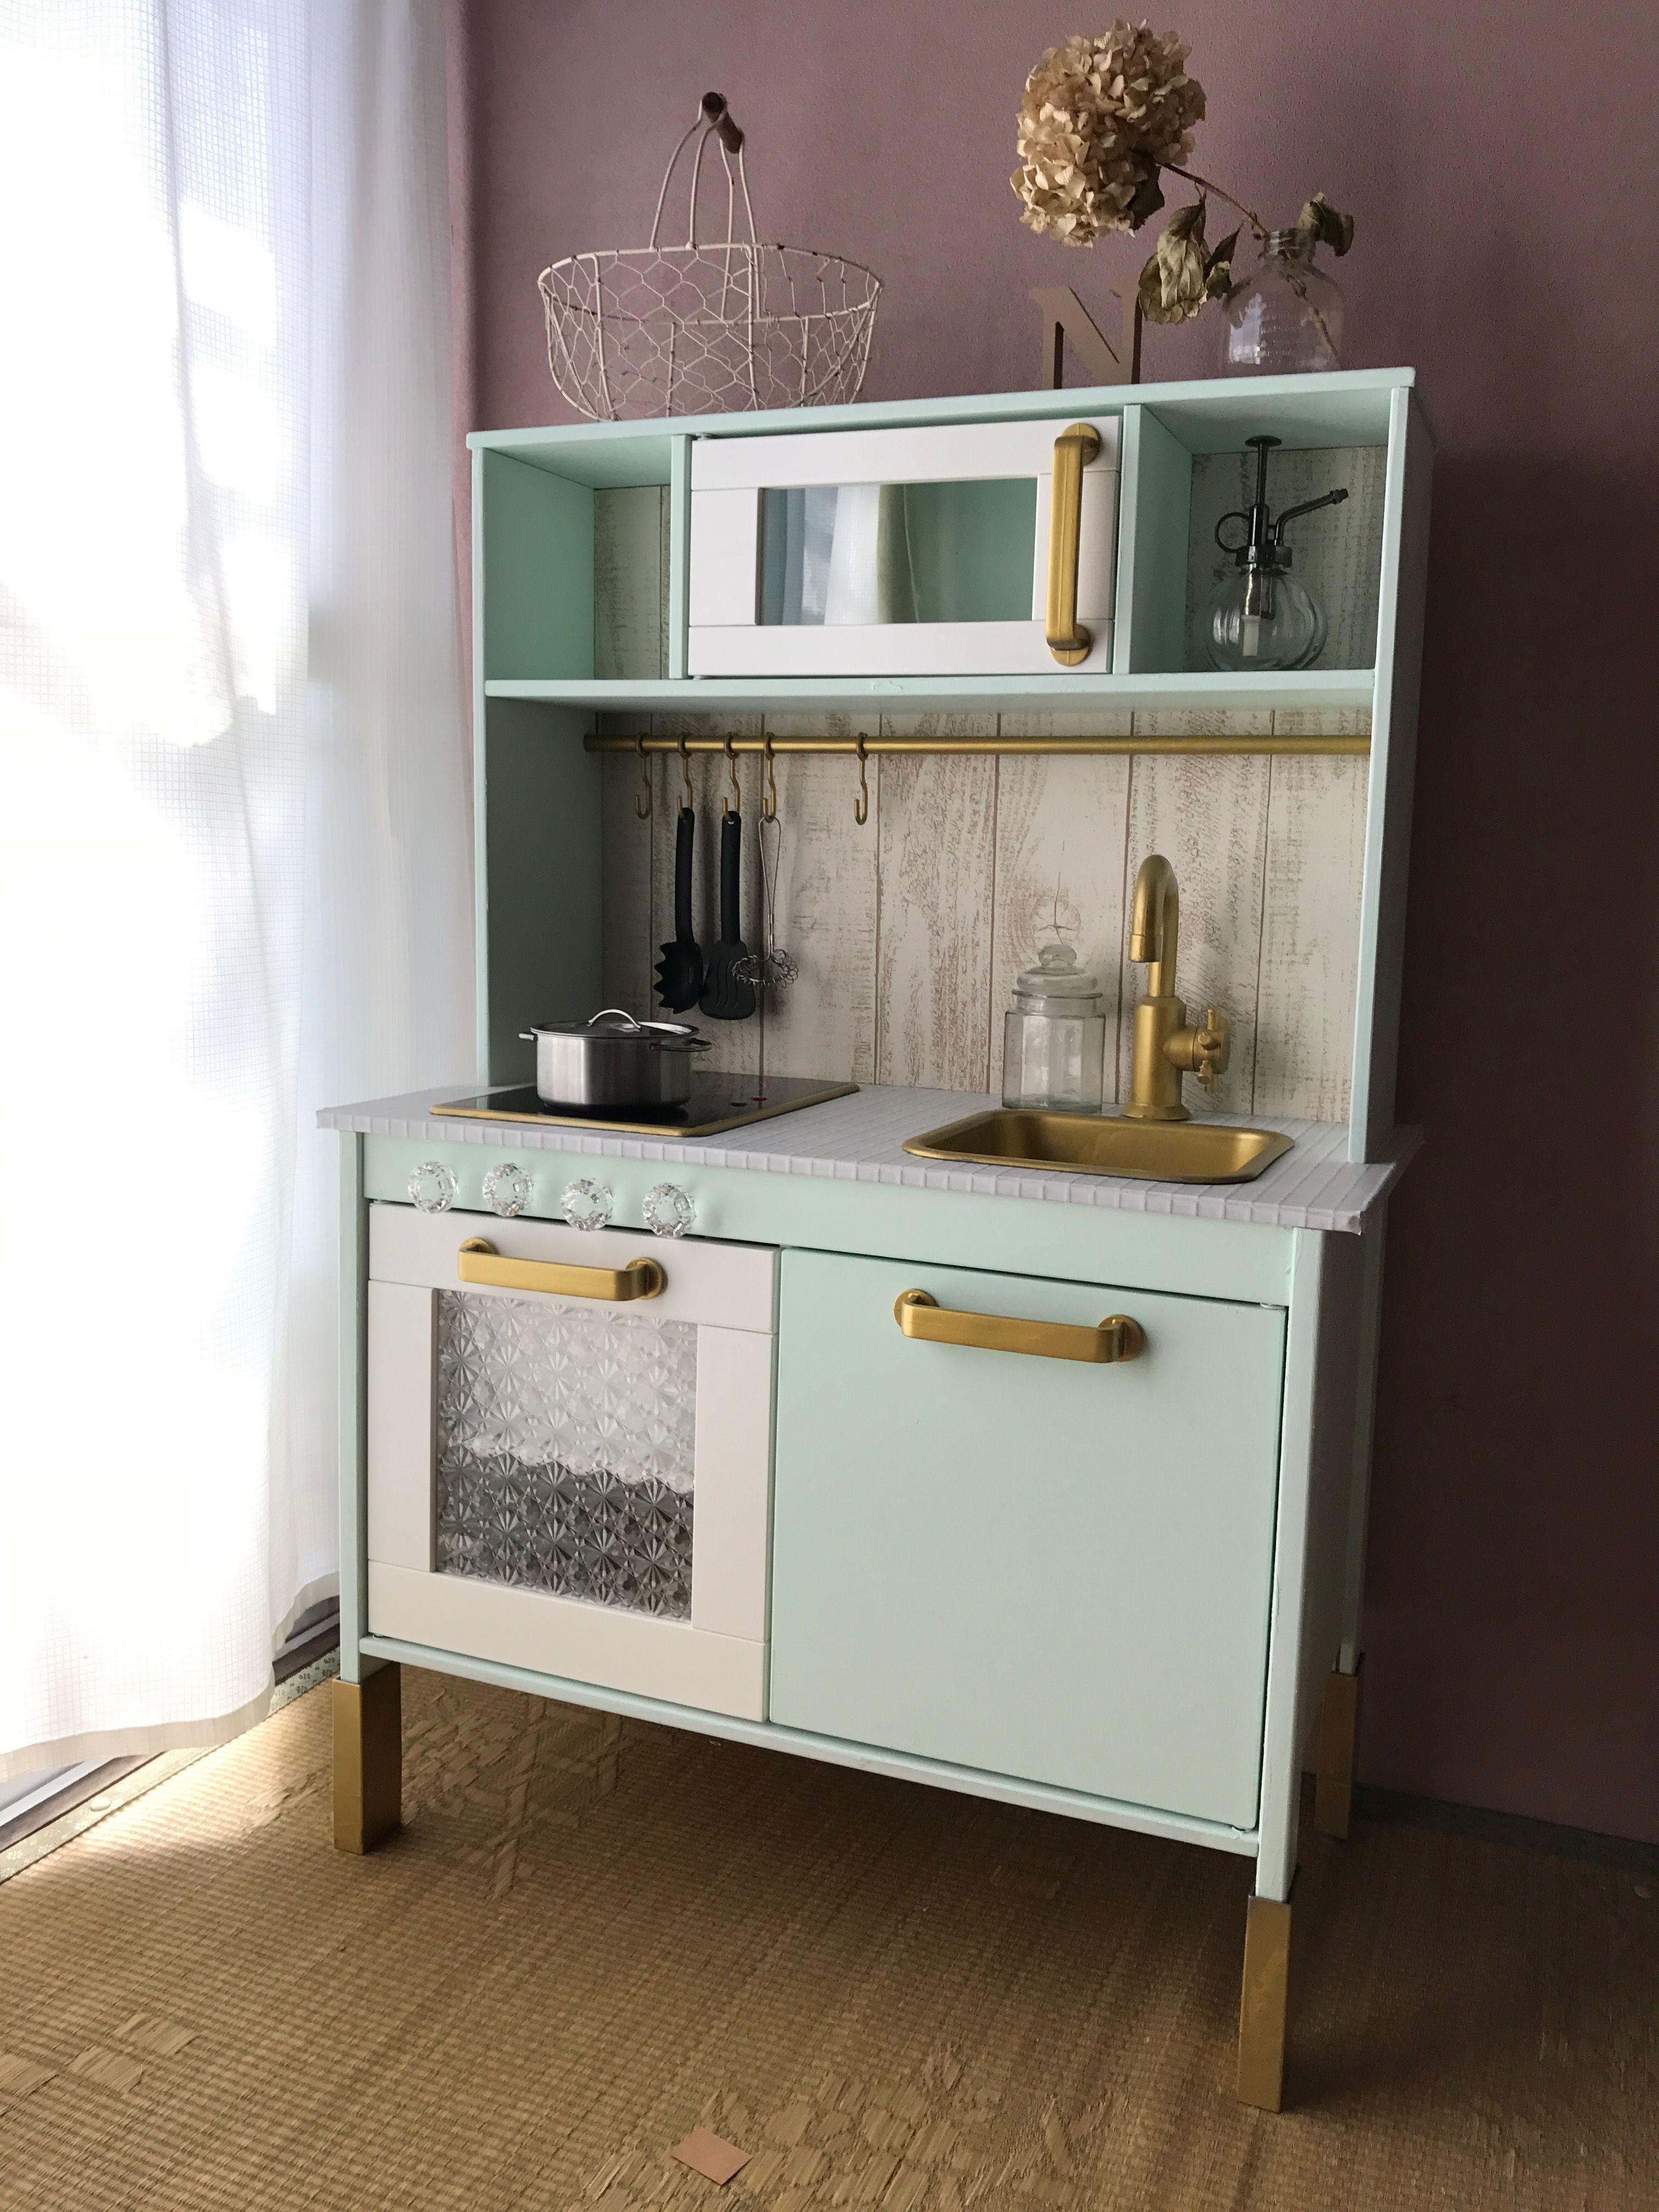 Cocina Infantil Ikea Personalizada Colores Pastel Minimoi  # Muebles Roles Mesillas